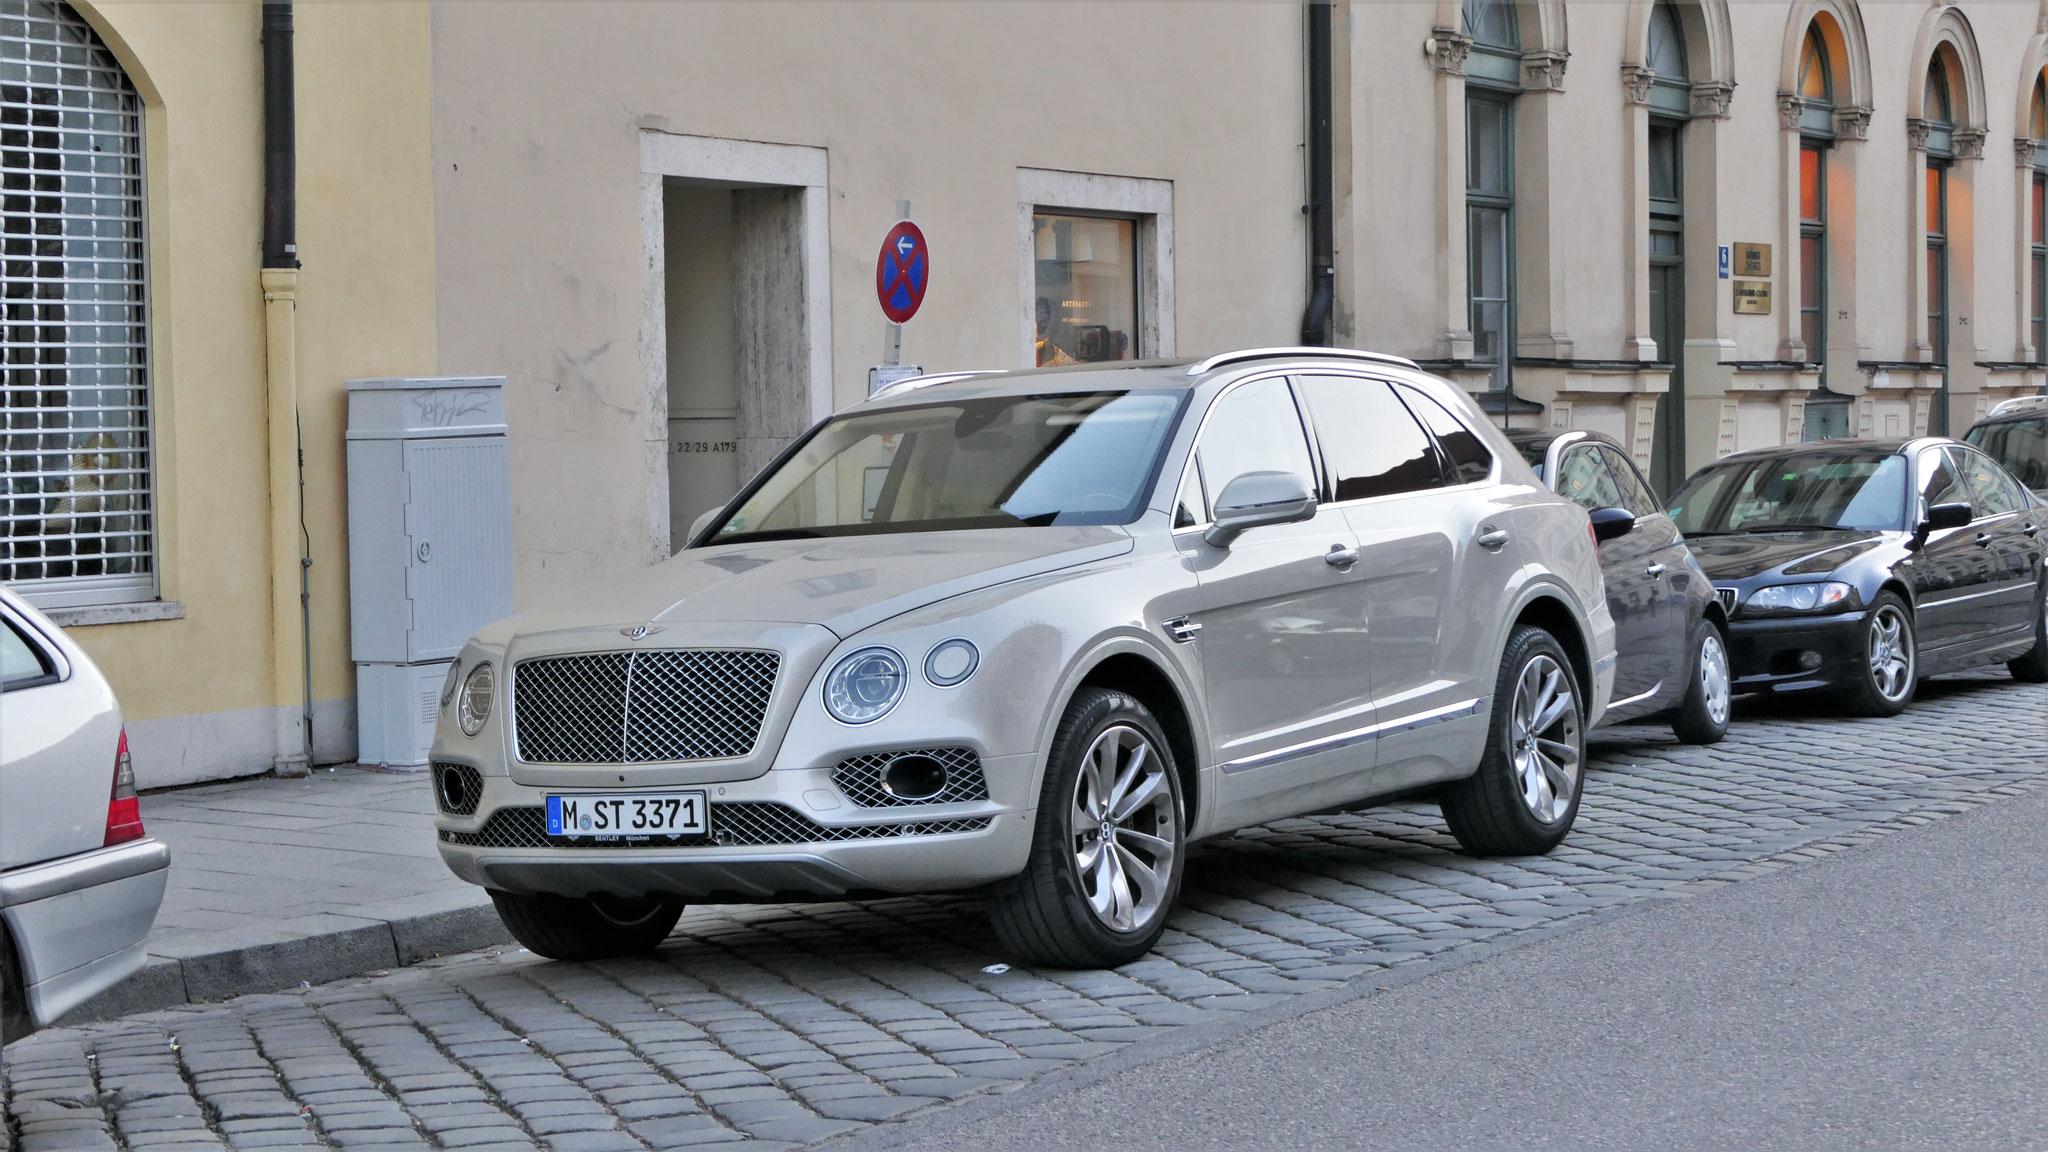 Bentley Bentayga - M-ST-3371